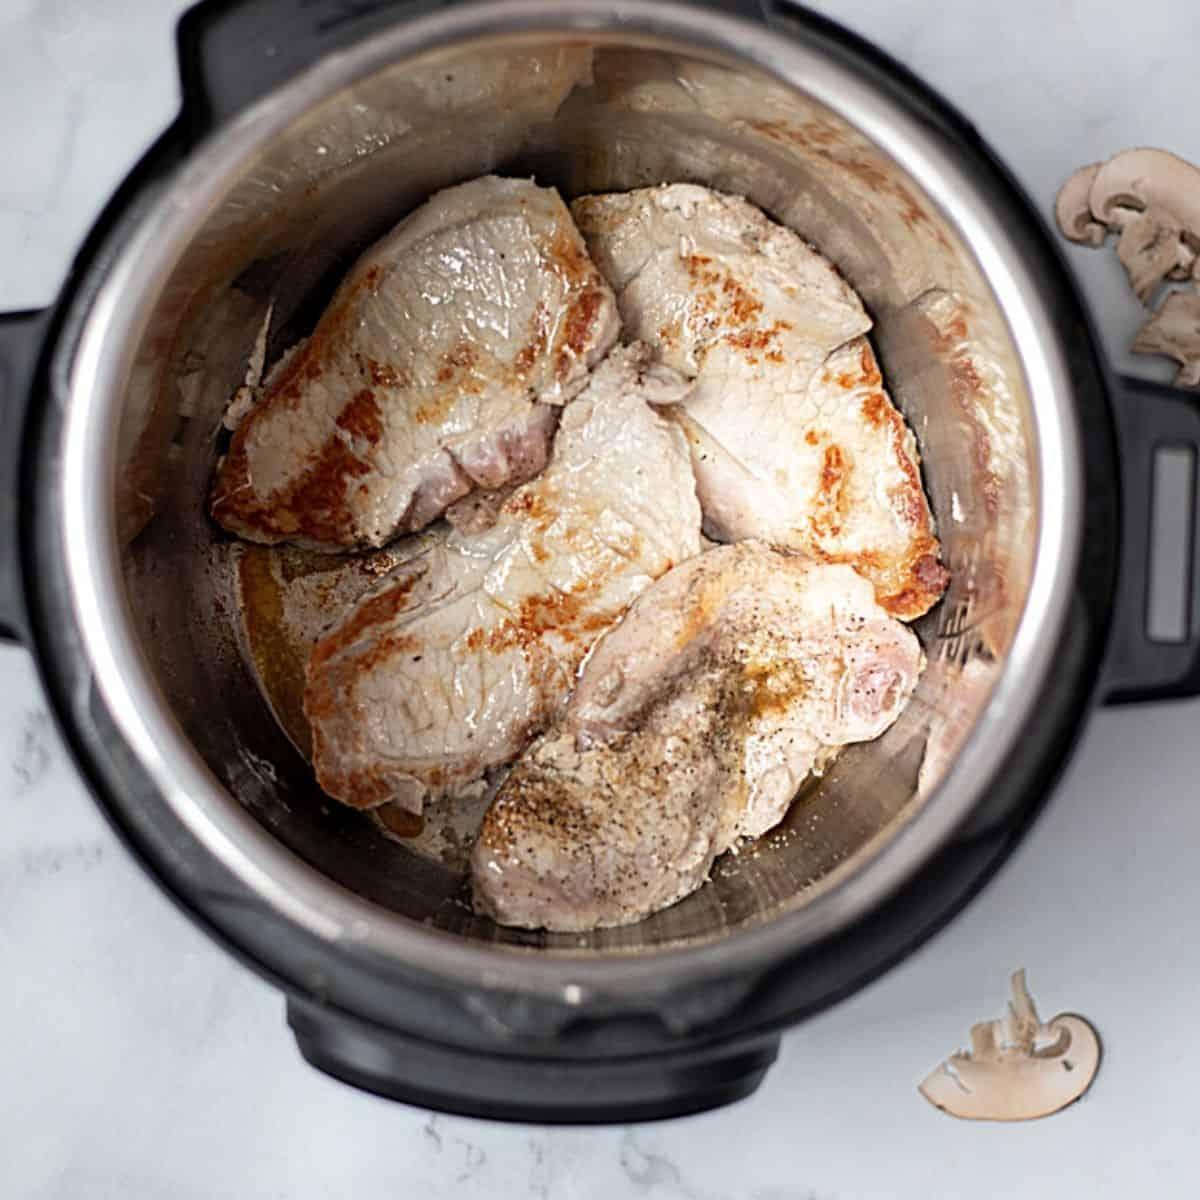 Seared pork chops in inner pot.